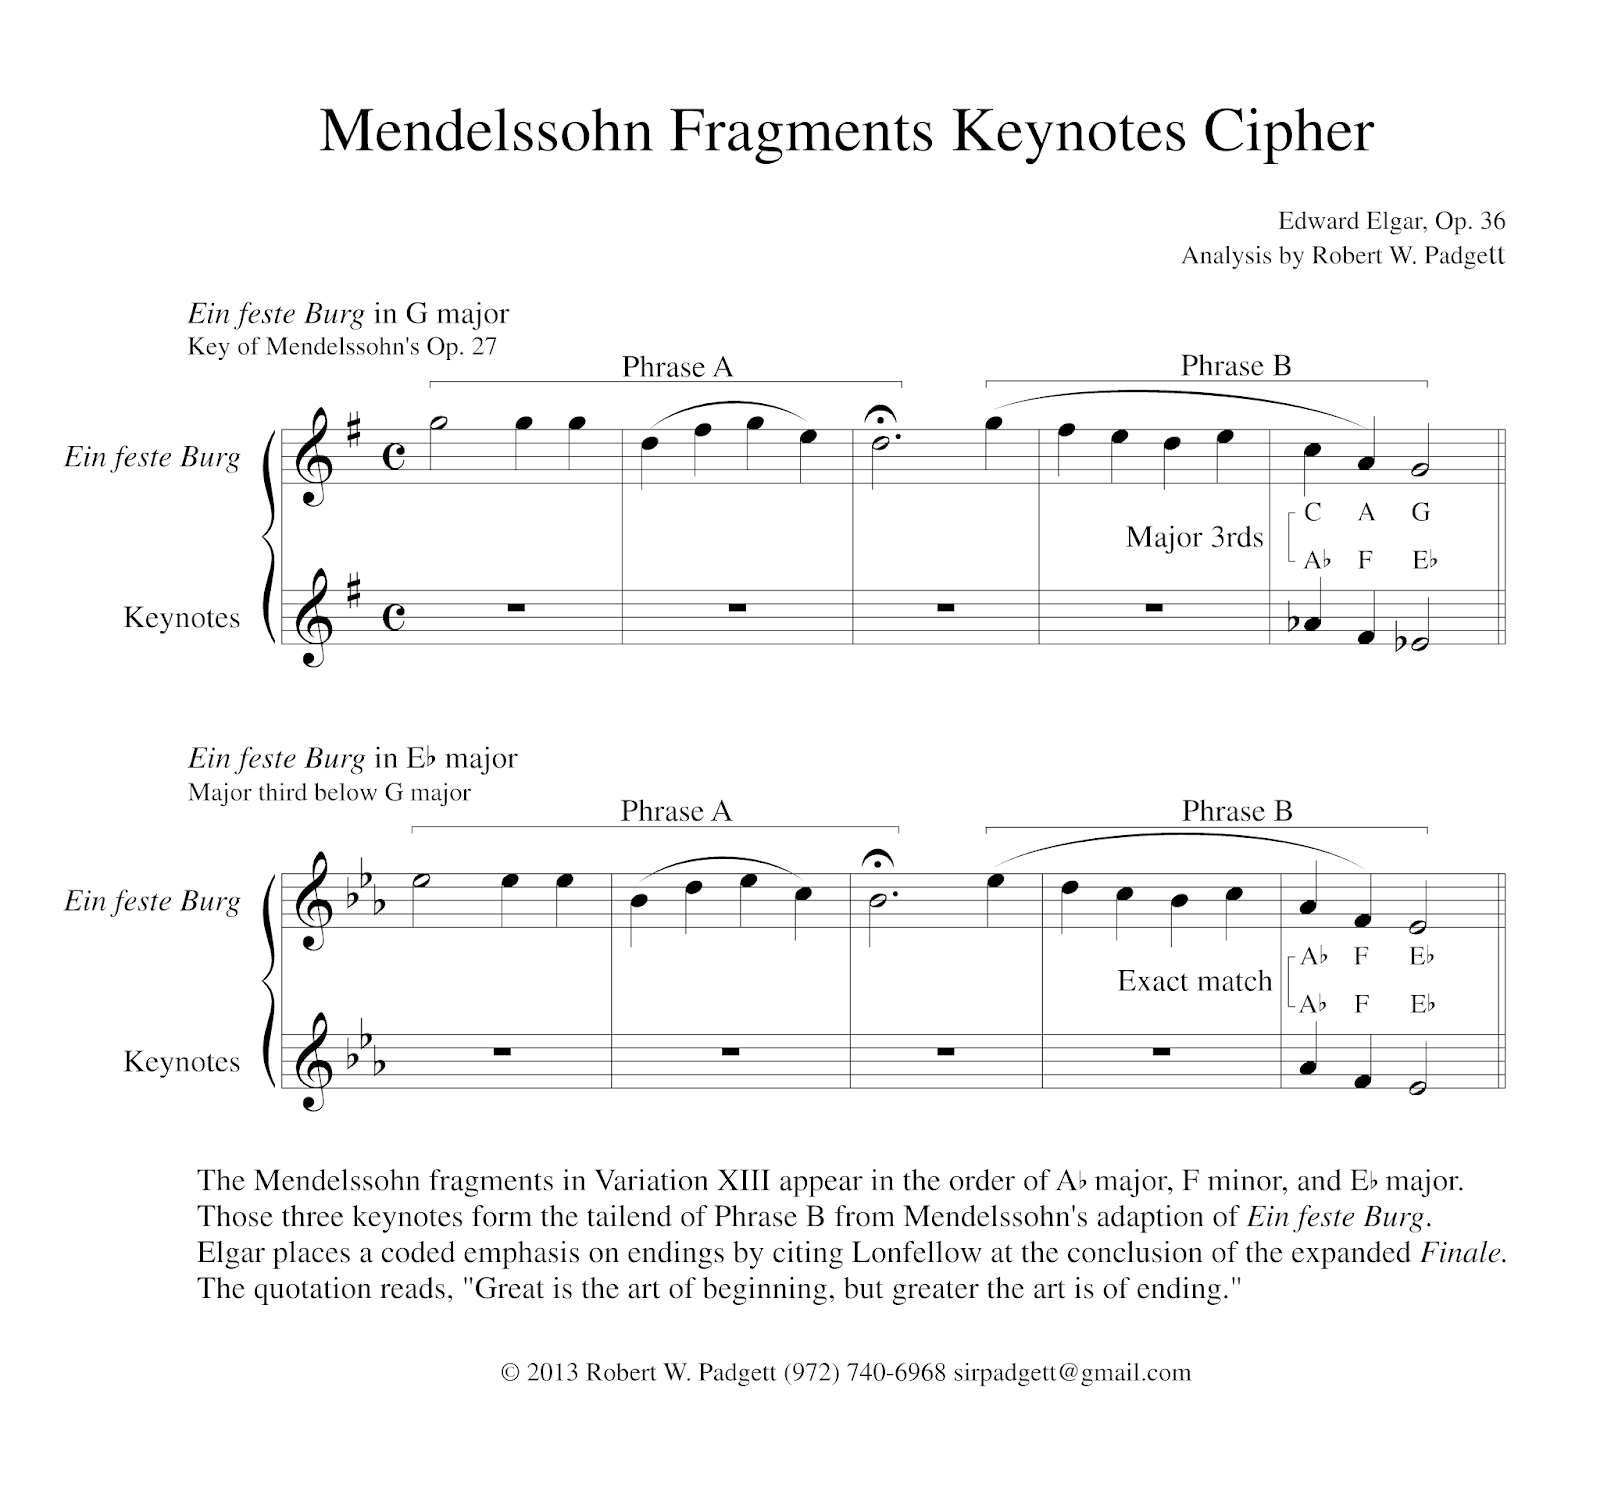 Cipher – Elgar's Enigmas Exposed